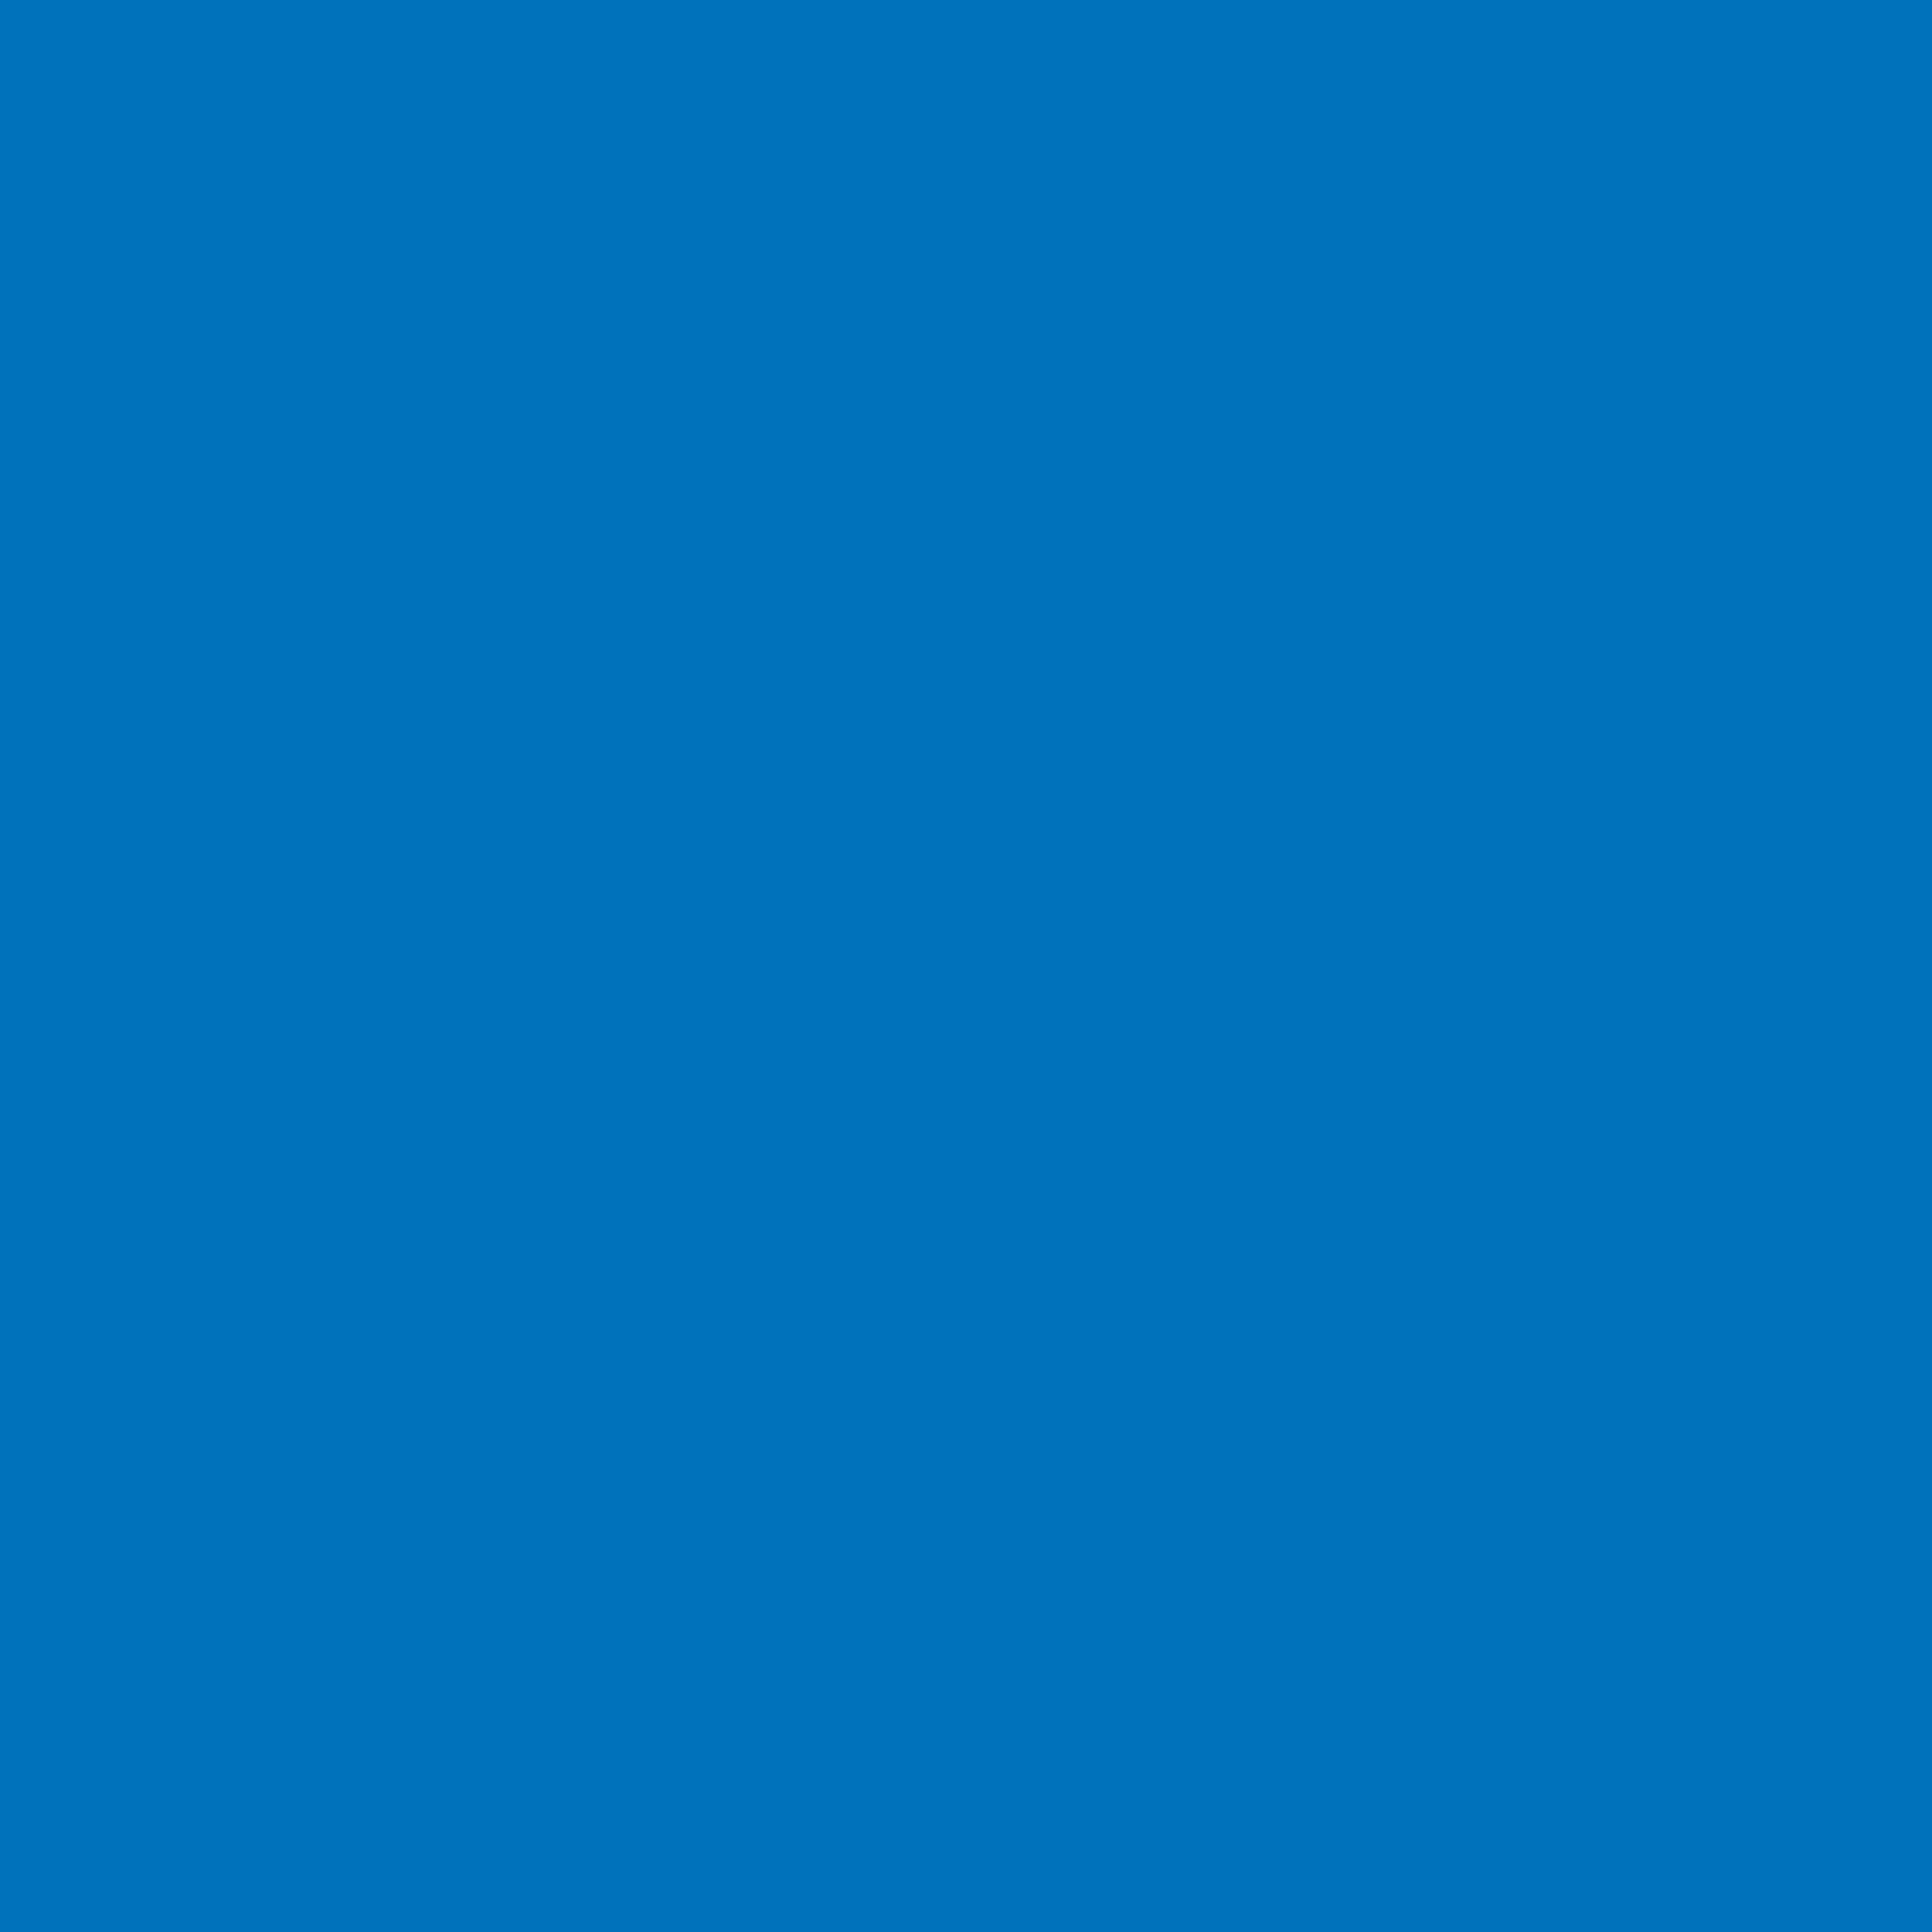 Pentel Sharp Automatic Pencil, 0.7mm Lead Size, Blue Barrel, Box of 12 (P207C) by Pentel (Image #2)